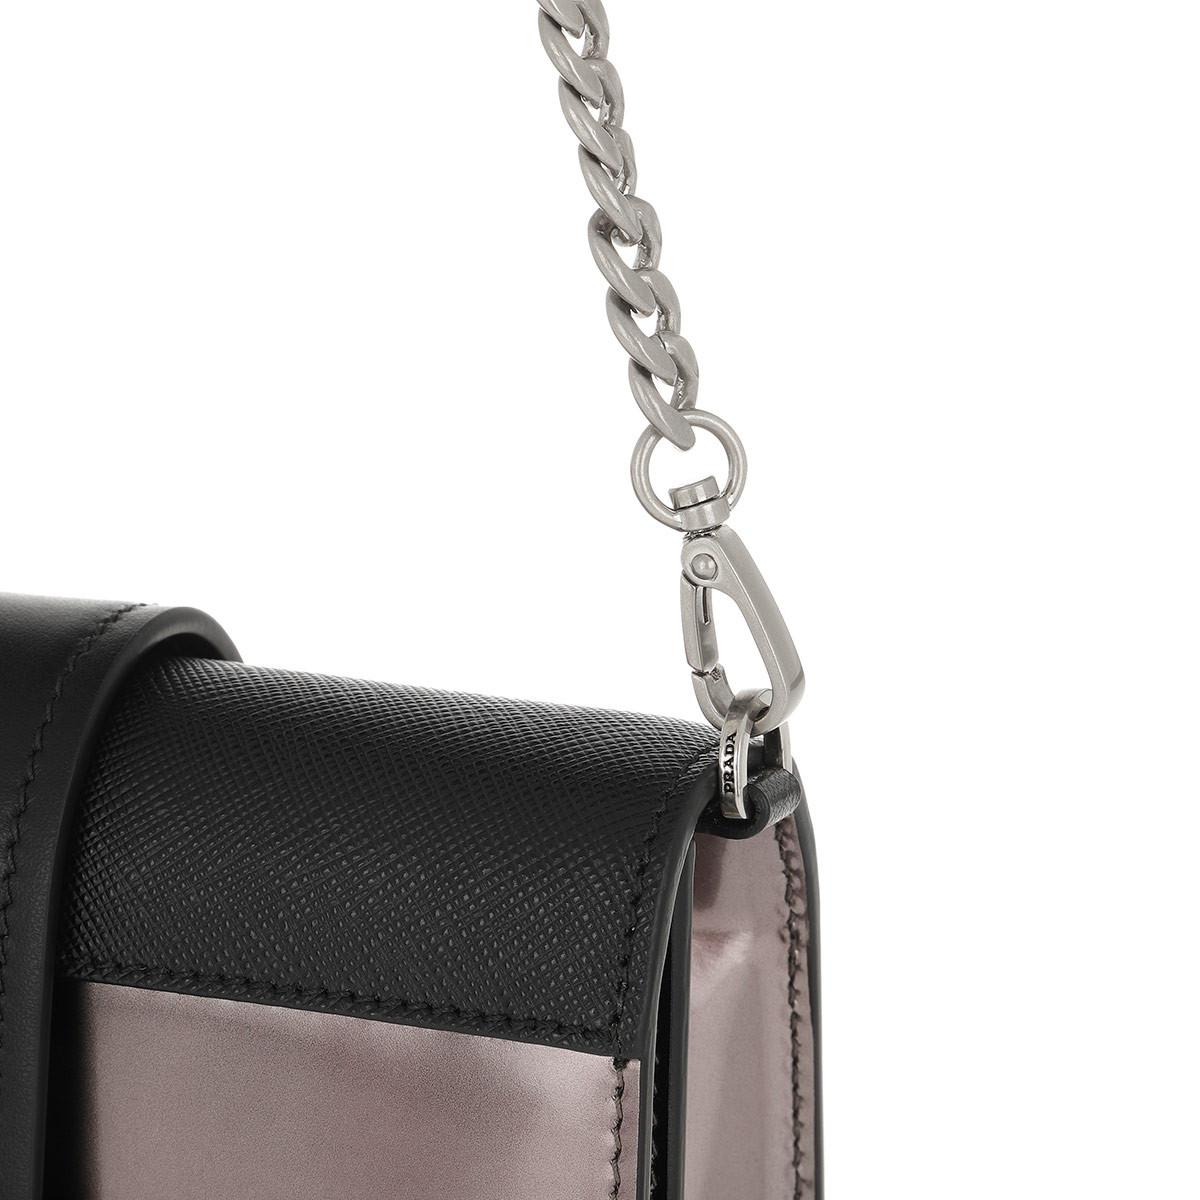 db32084803a8 Prada Cahier Shoulder Bag Metallic Leather Cammeo/nero in Black - Lyst